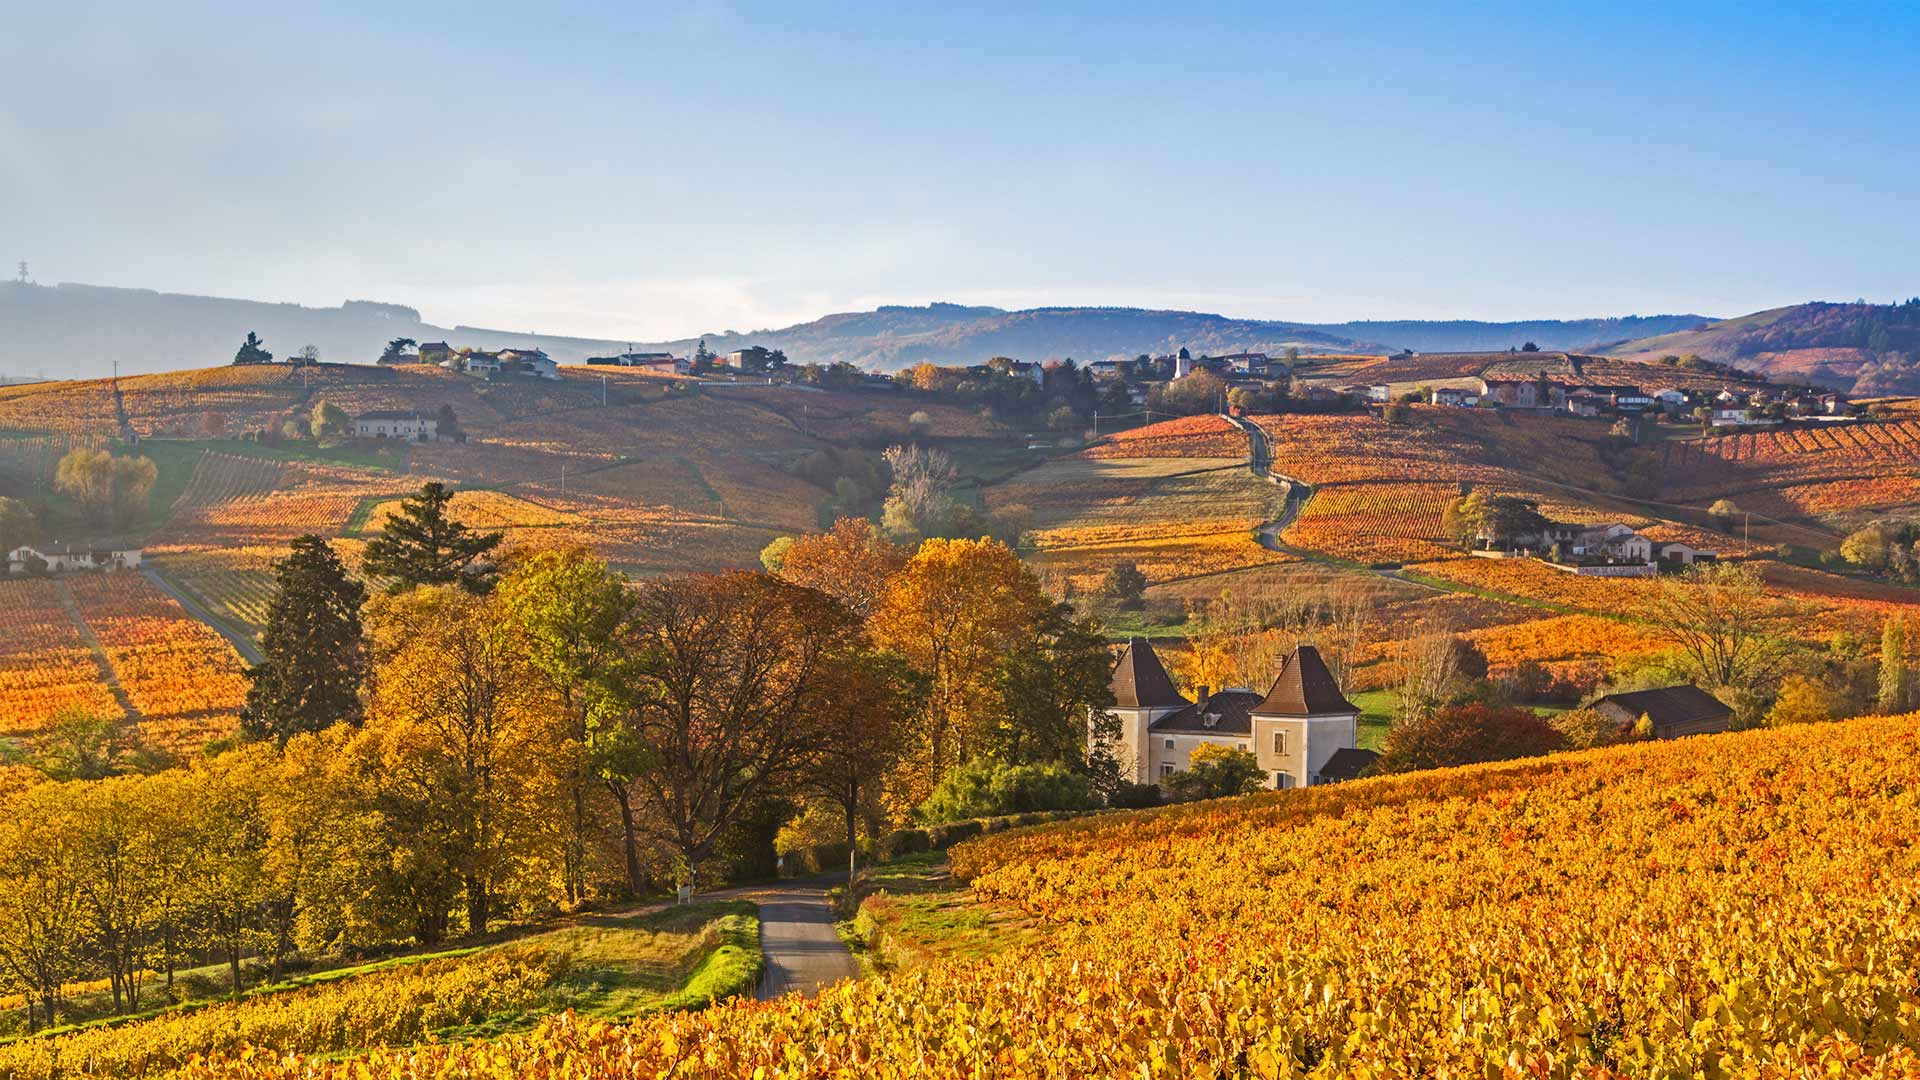 Lantignié in the Beaujolais region of France (© Jon Arnold/Danita Delimont)